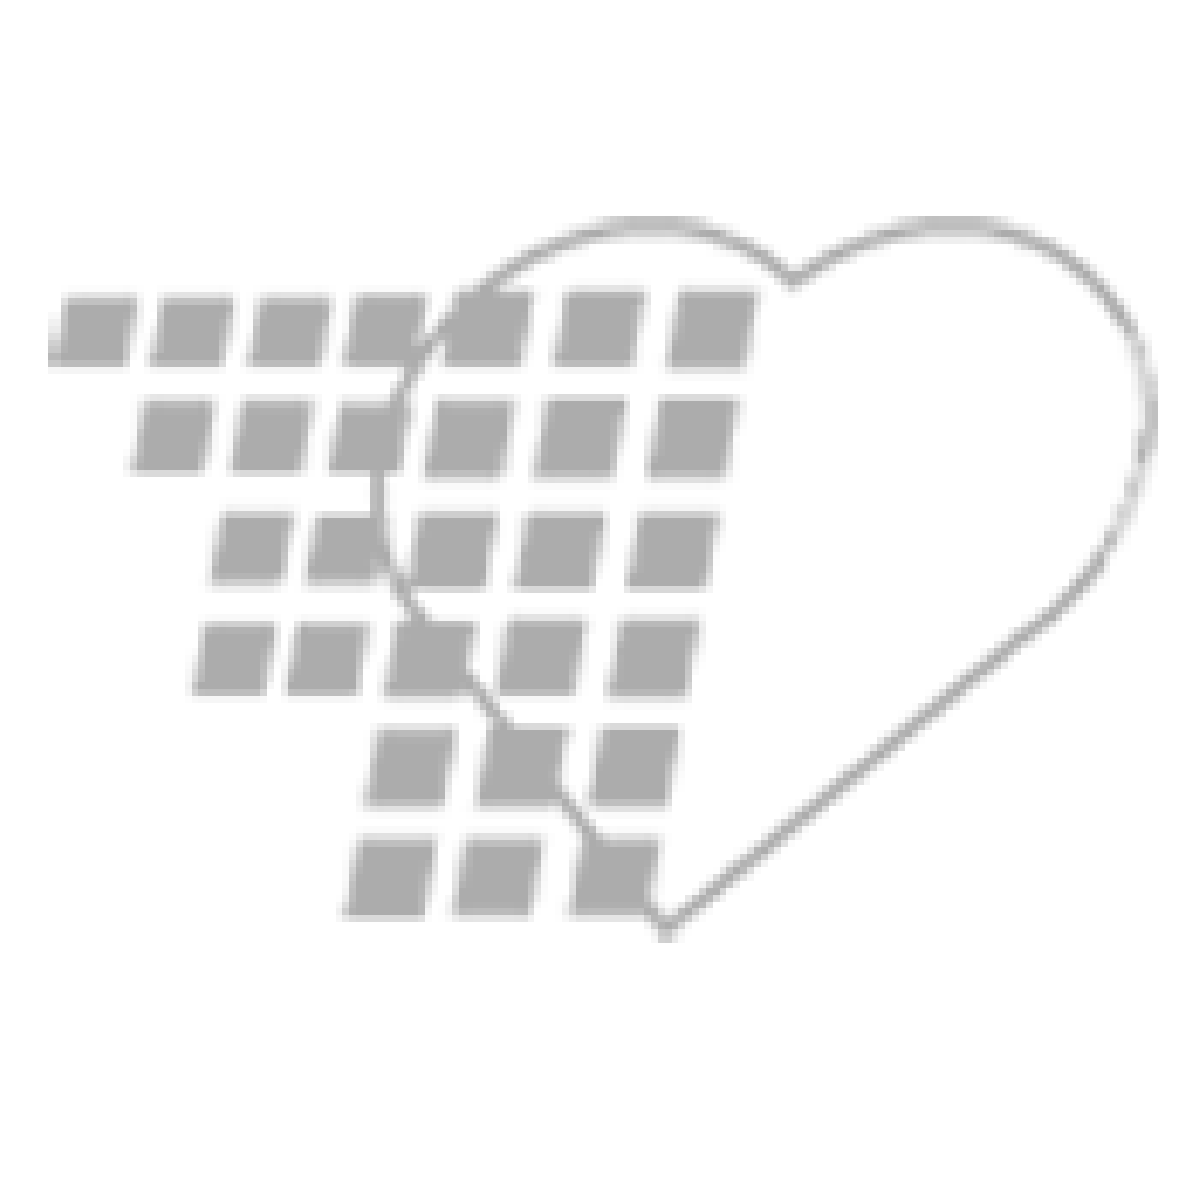 "06-26-1123 Angiocath IV Catheter - 22G x 1"""